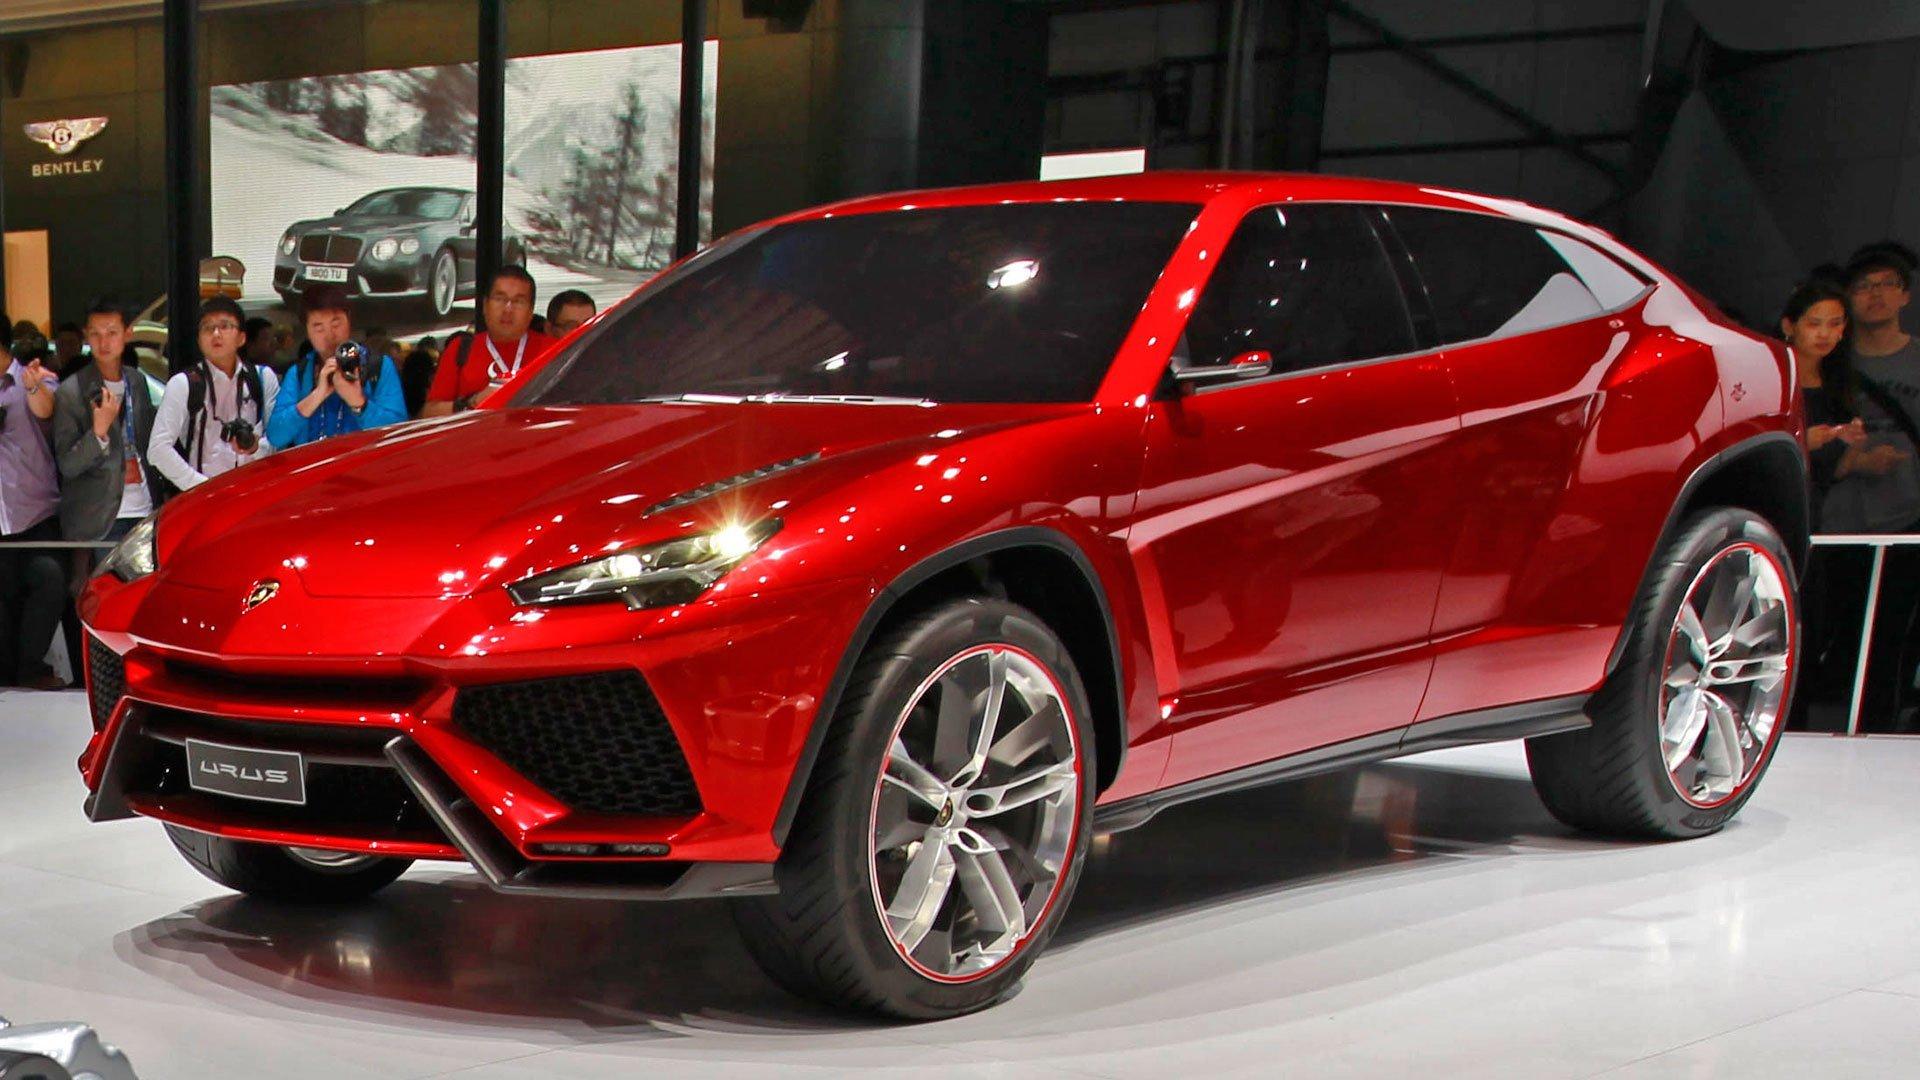 Lamborghini опубликовал видео процесса сборки кроссовера Urus